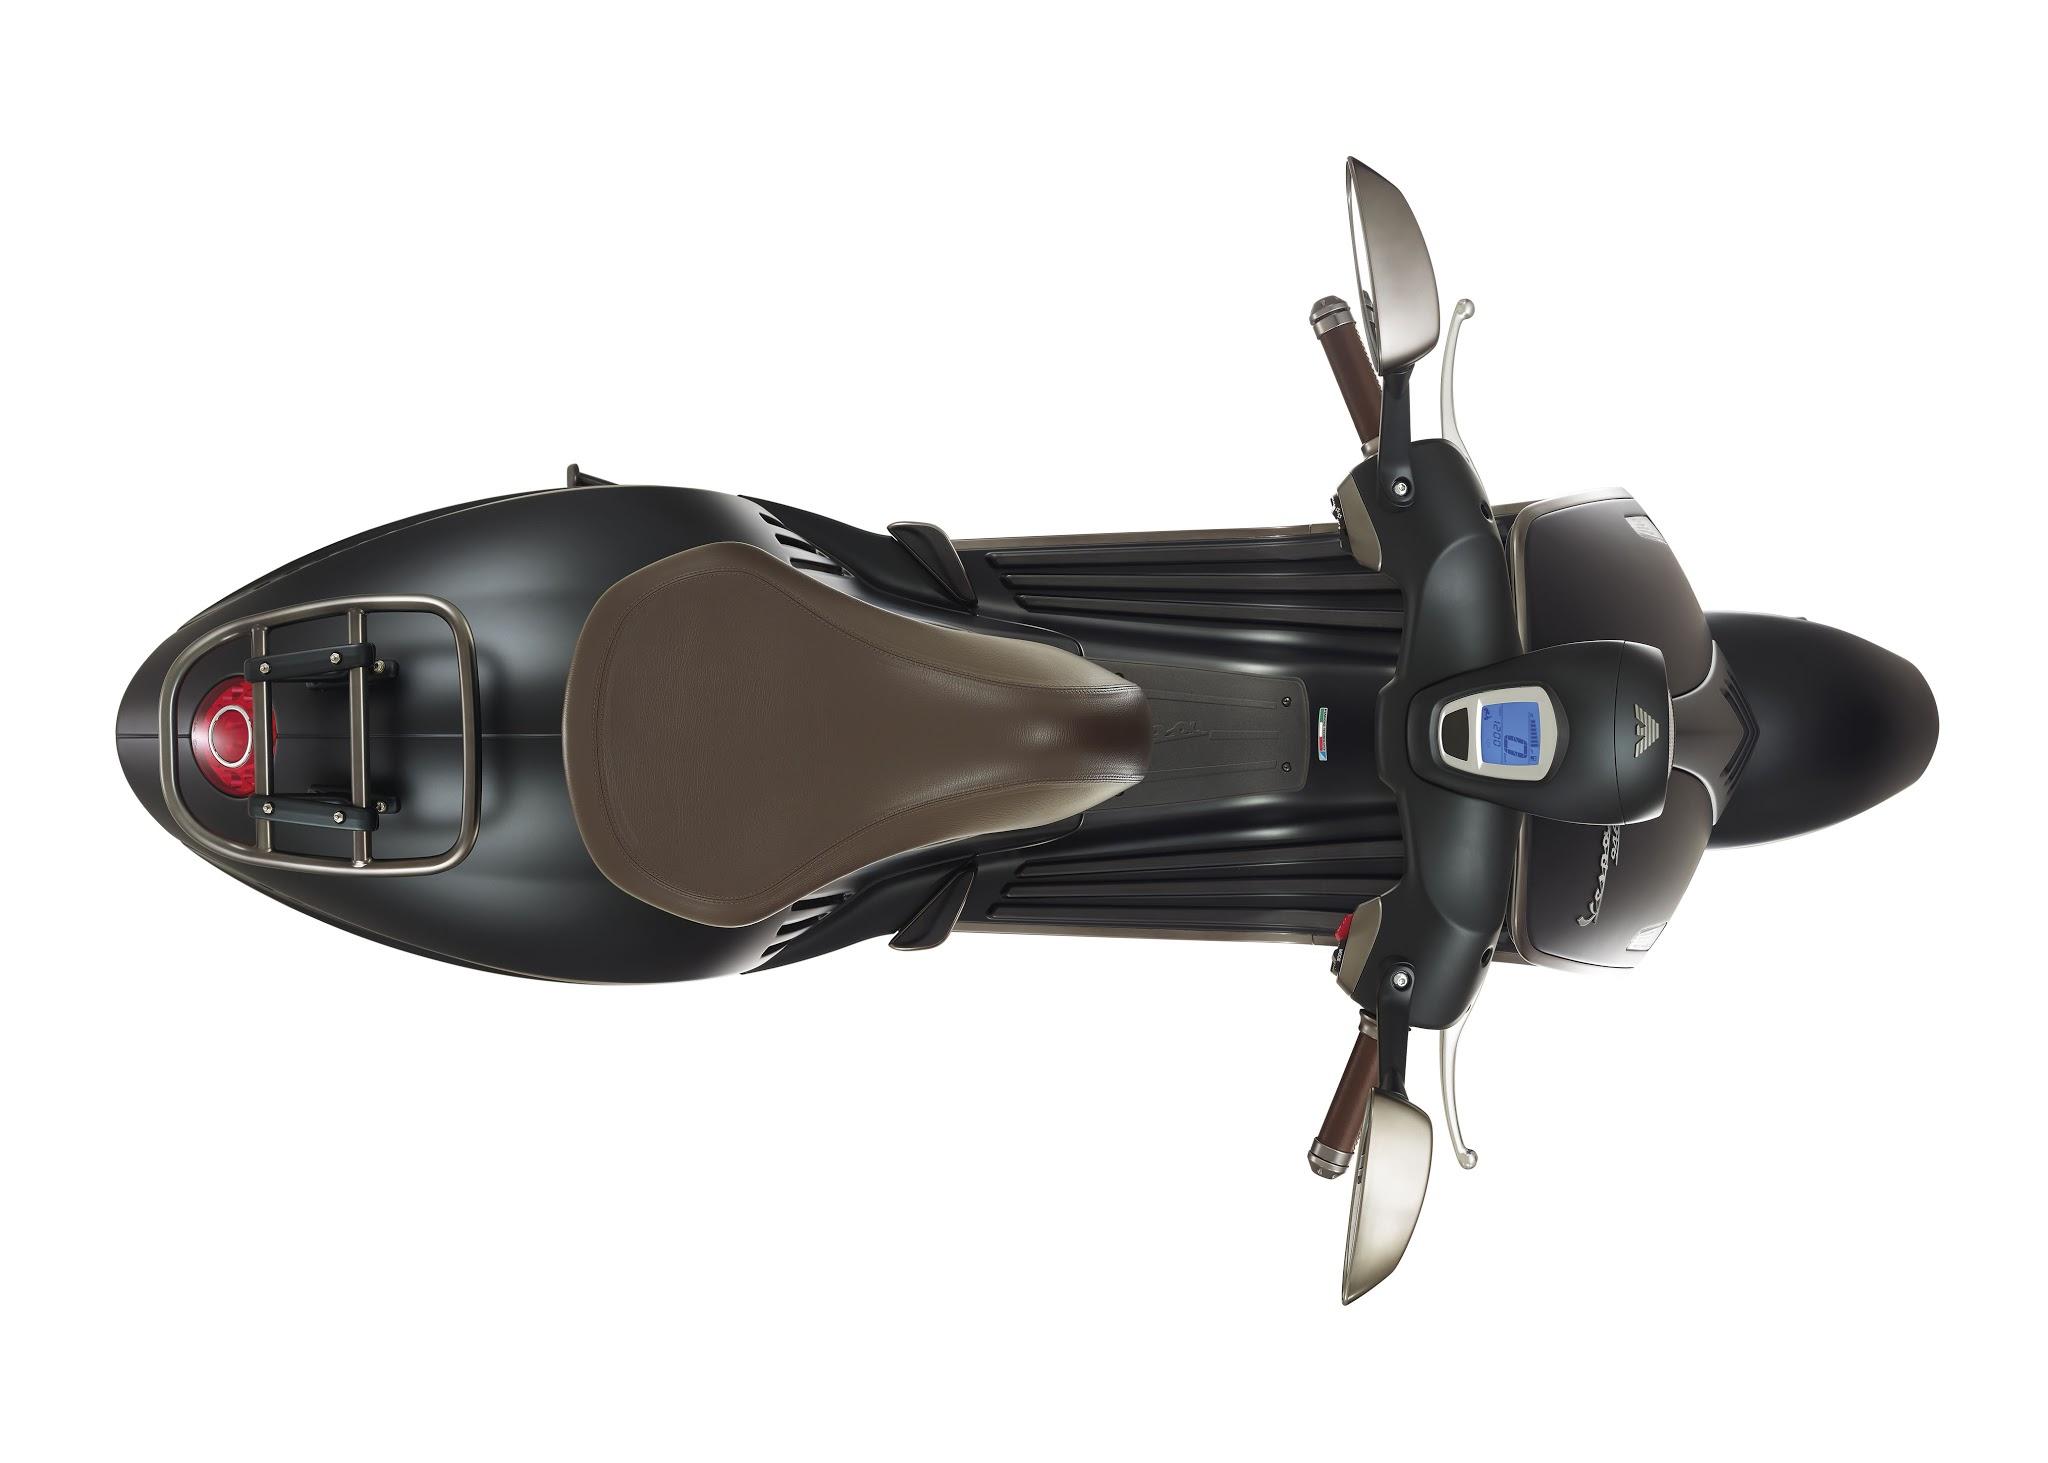 Vespa 946 Emporio Armani luxusni skutr